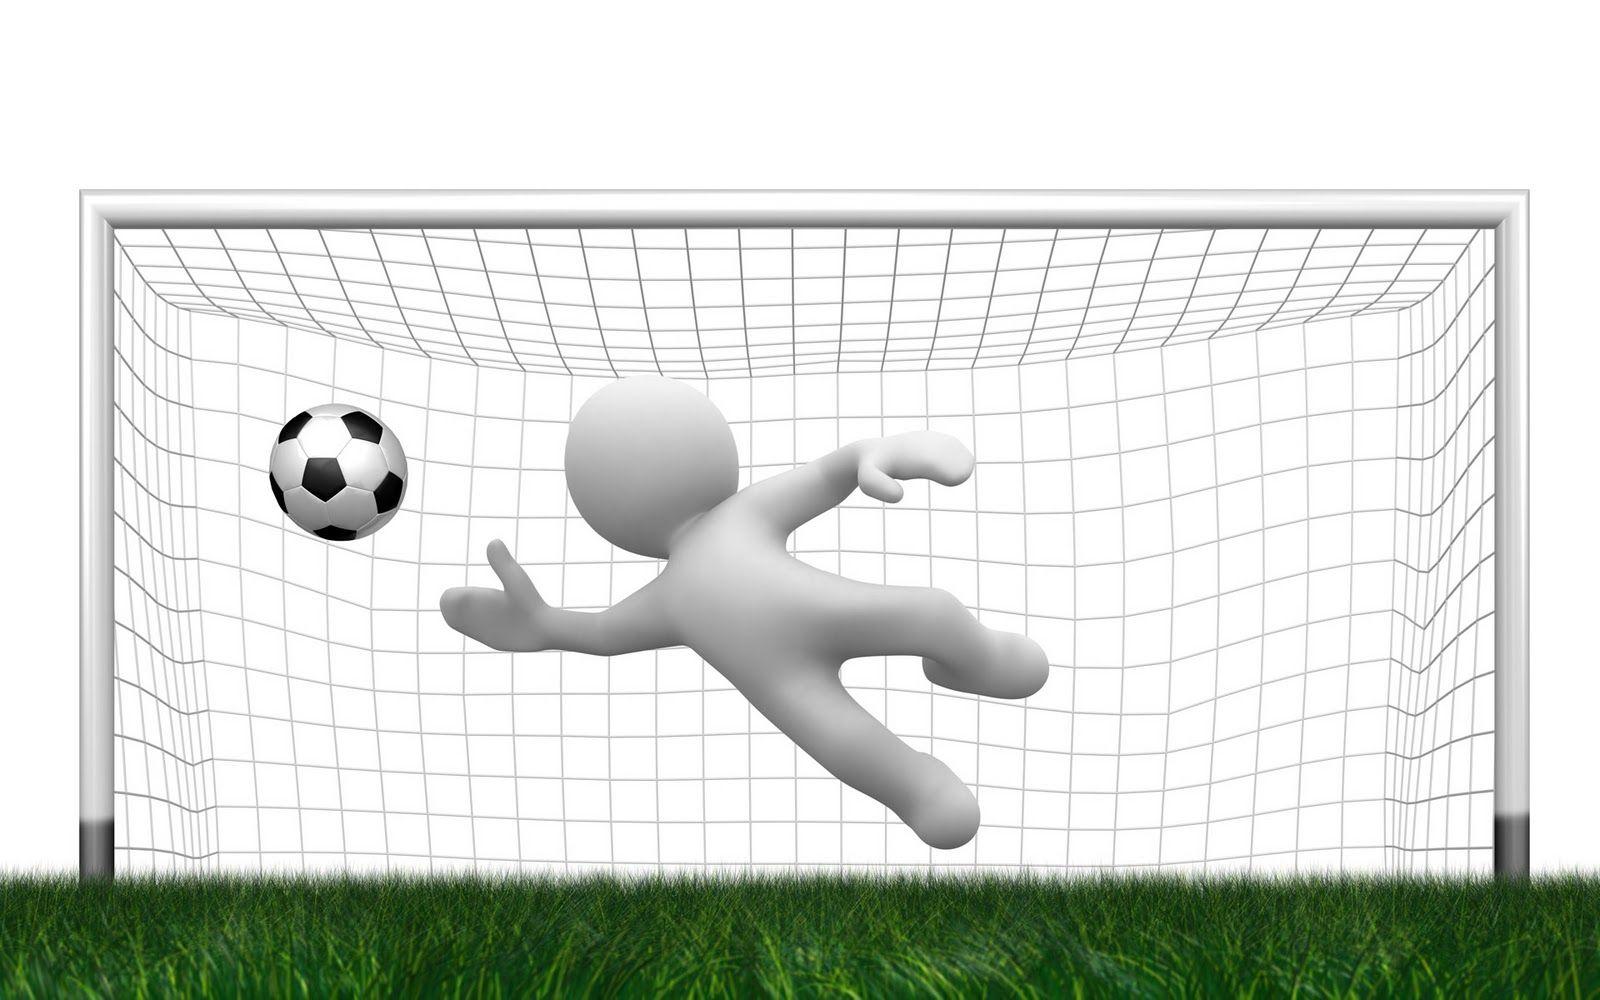 The Best Top Desktop Hd White Wallpapers White Wallpaper Goalkeeper 3d Man Downloadable Art